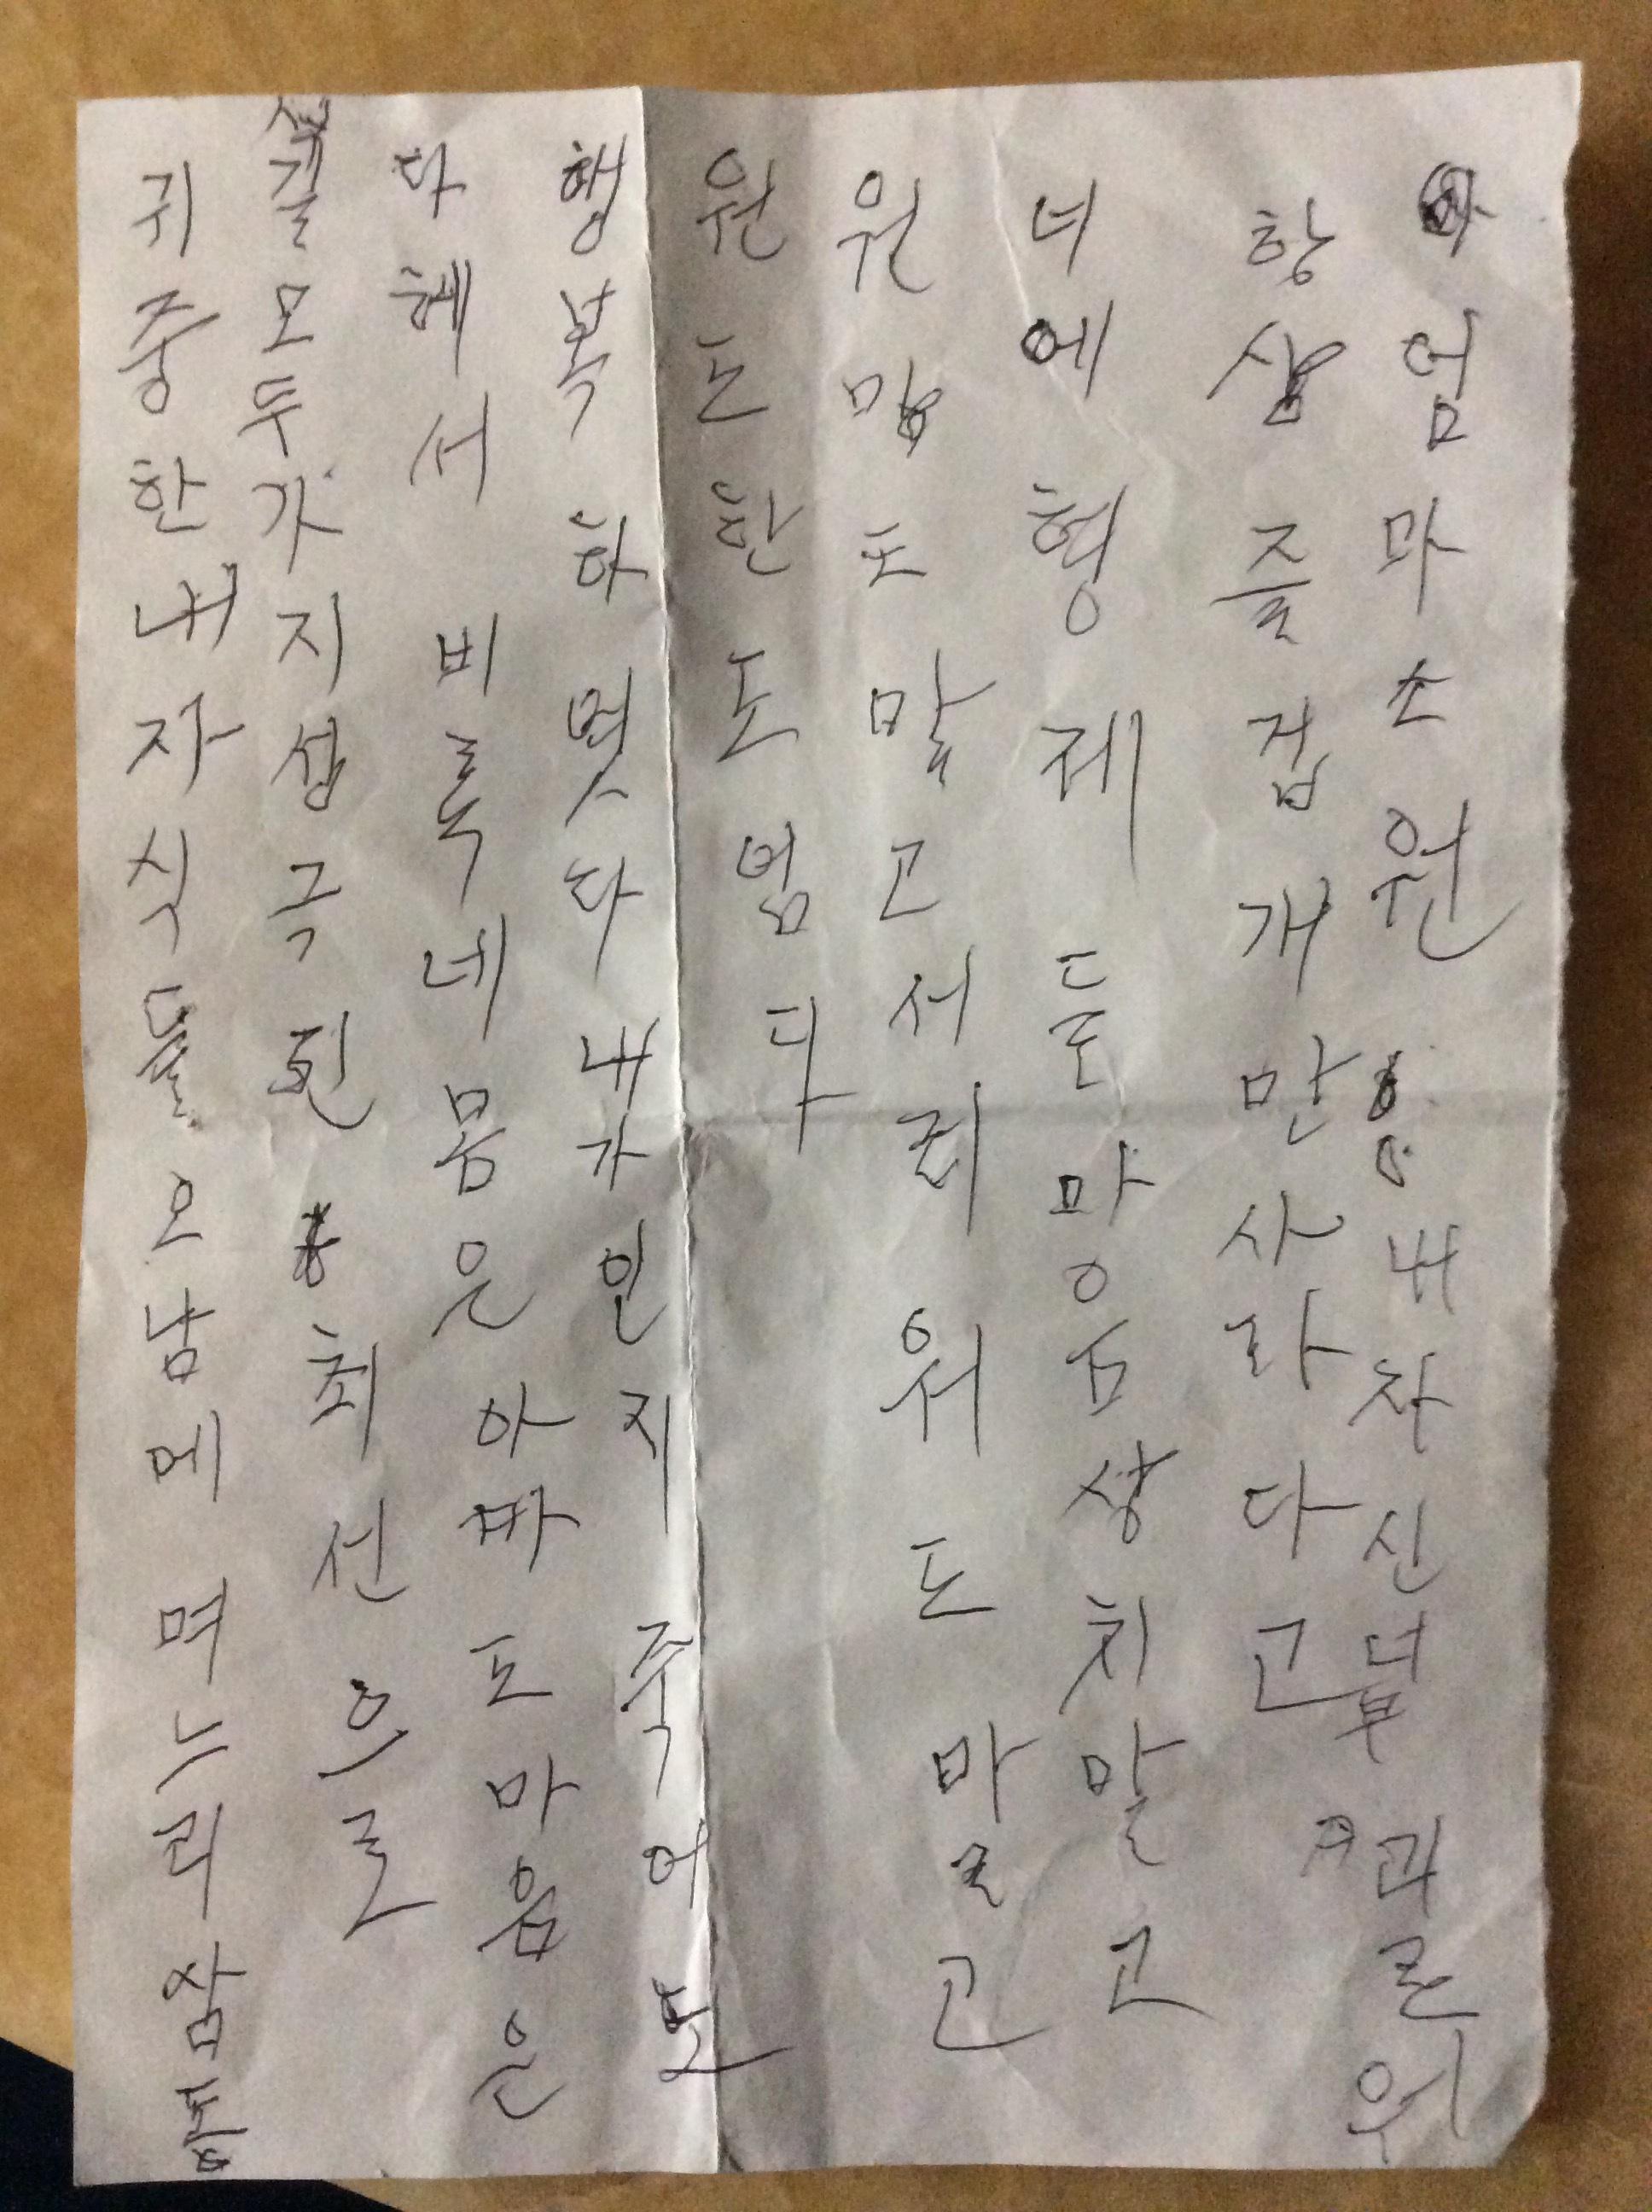 Seoyoung 001.JPG